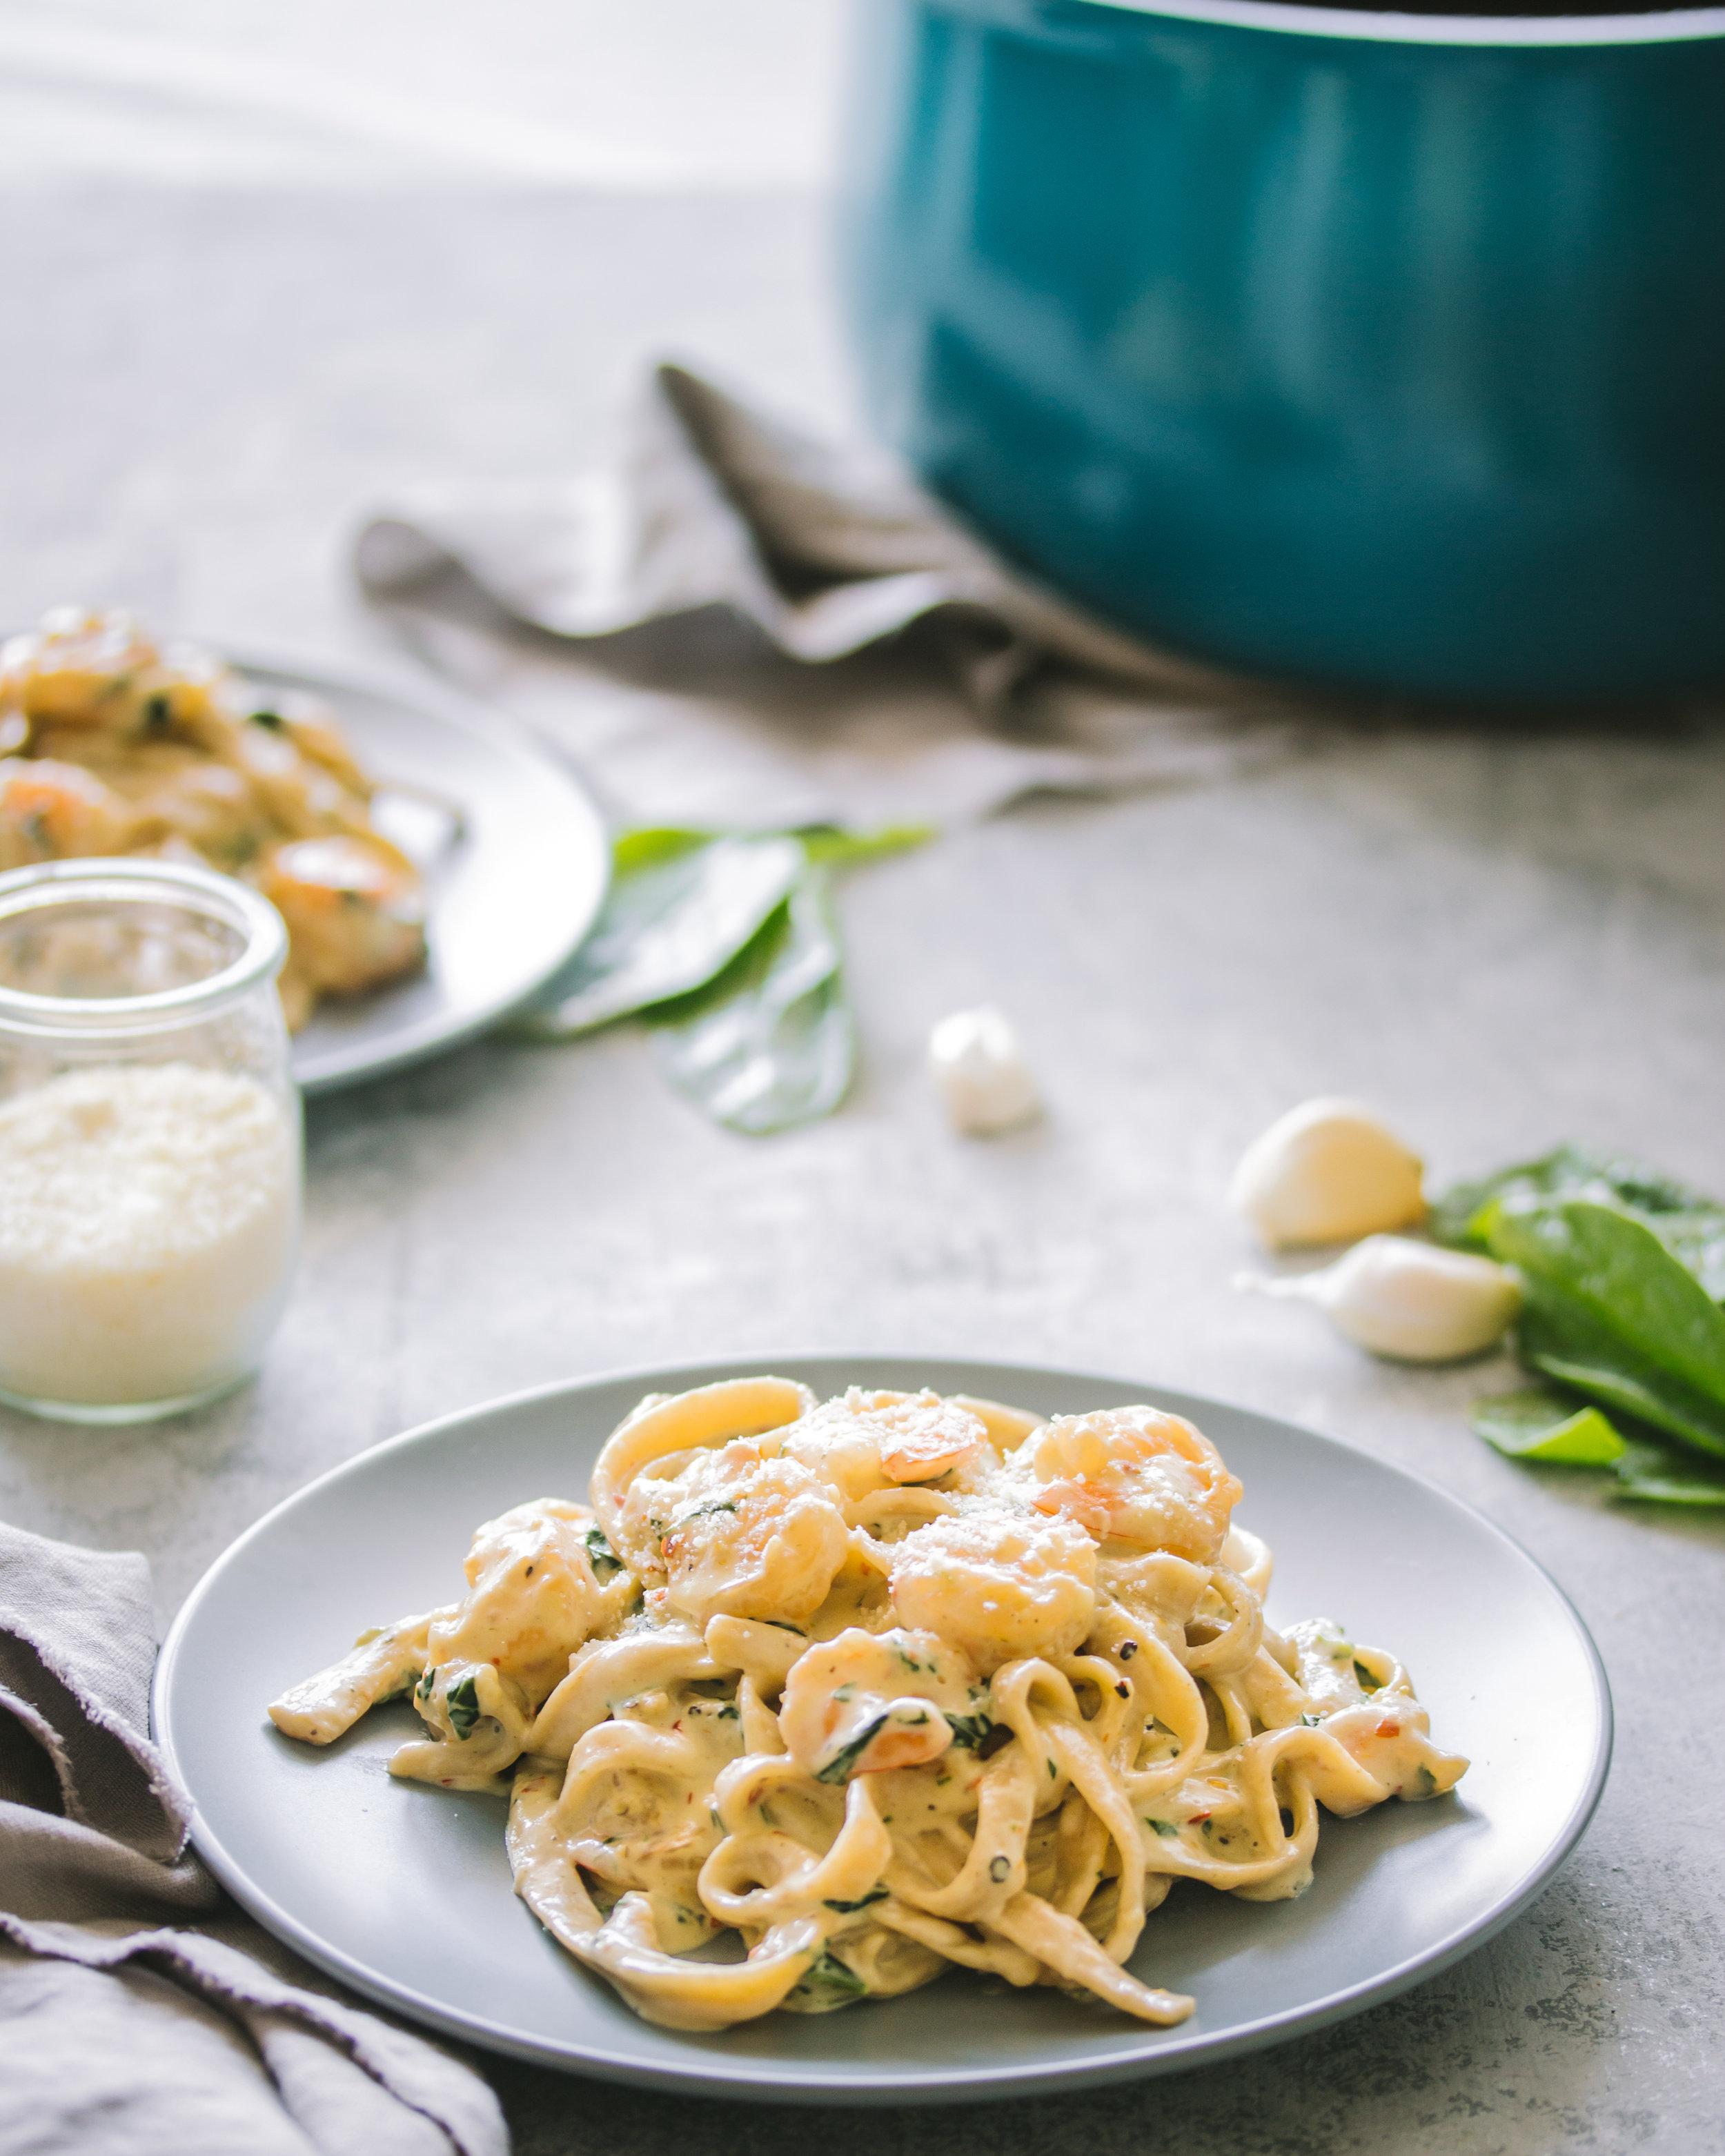 Creamy Garlic Shrimp Fettuccine Bialetti Pasta Pot.jpg